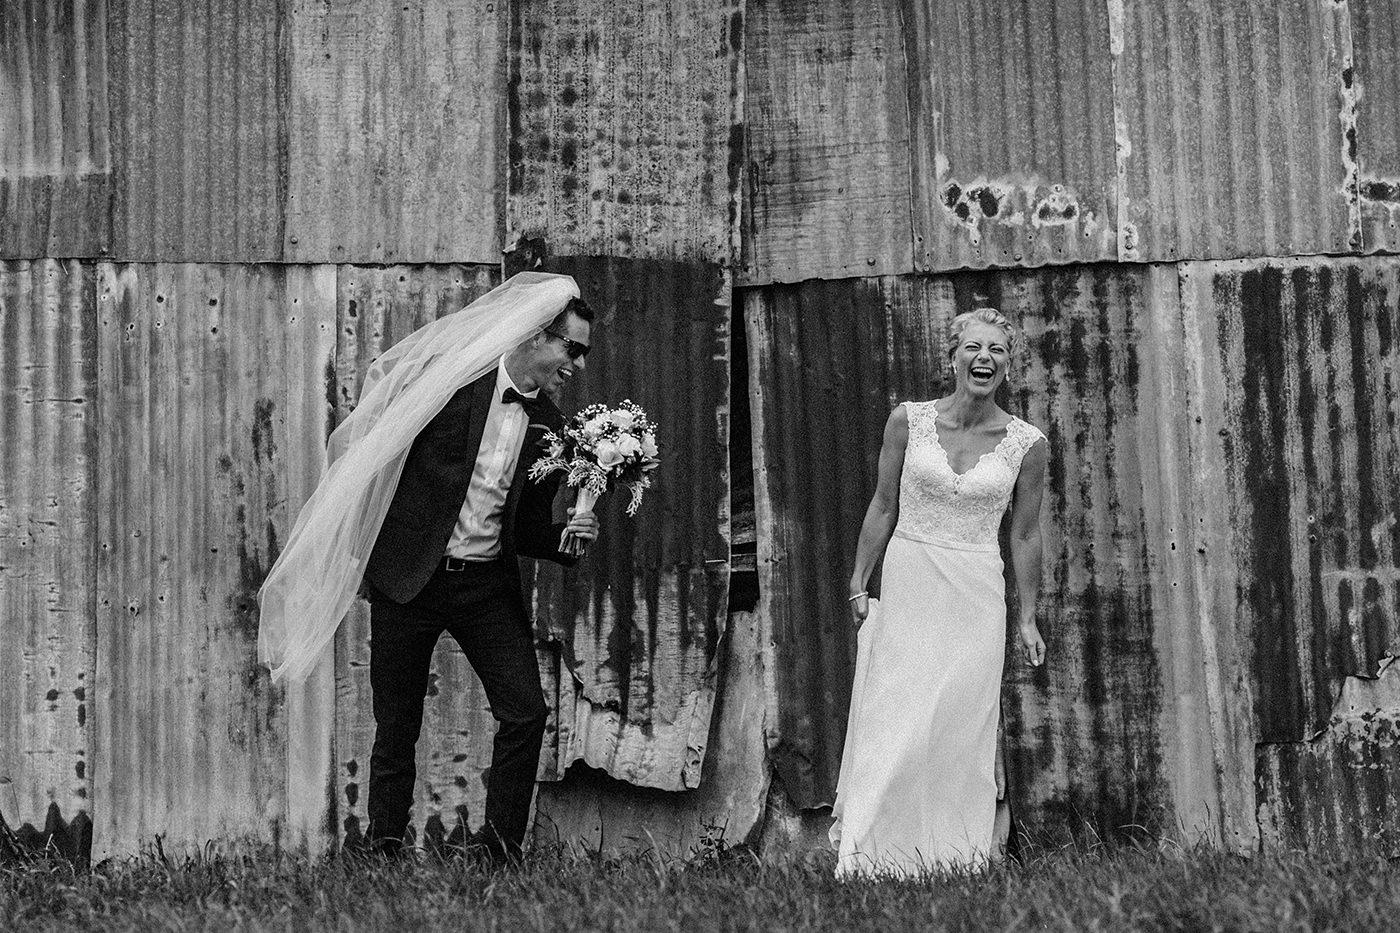 wedding_photographer_nz-00015.jpg